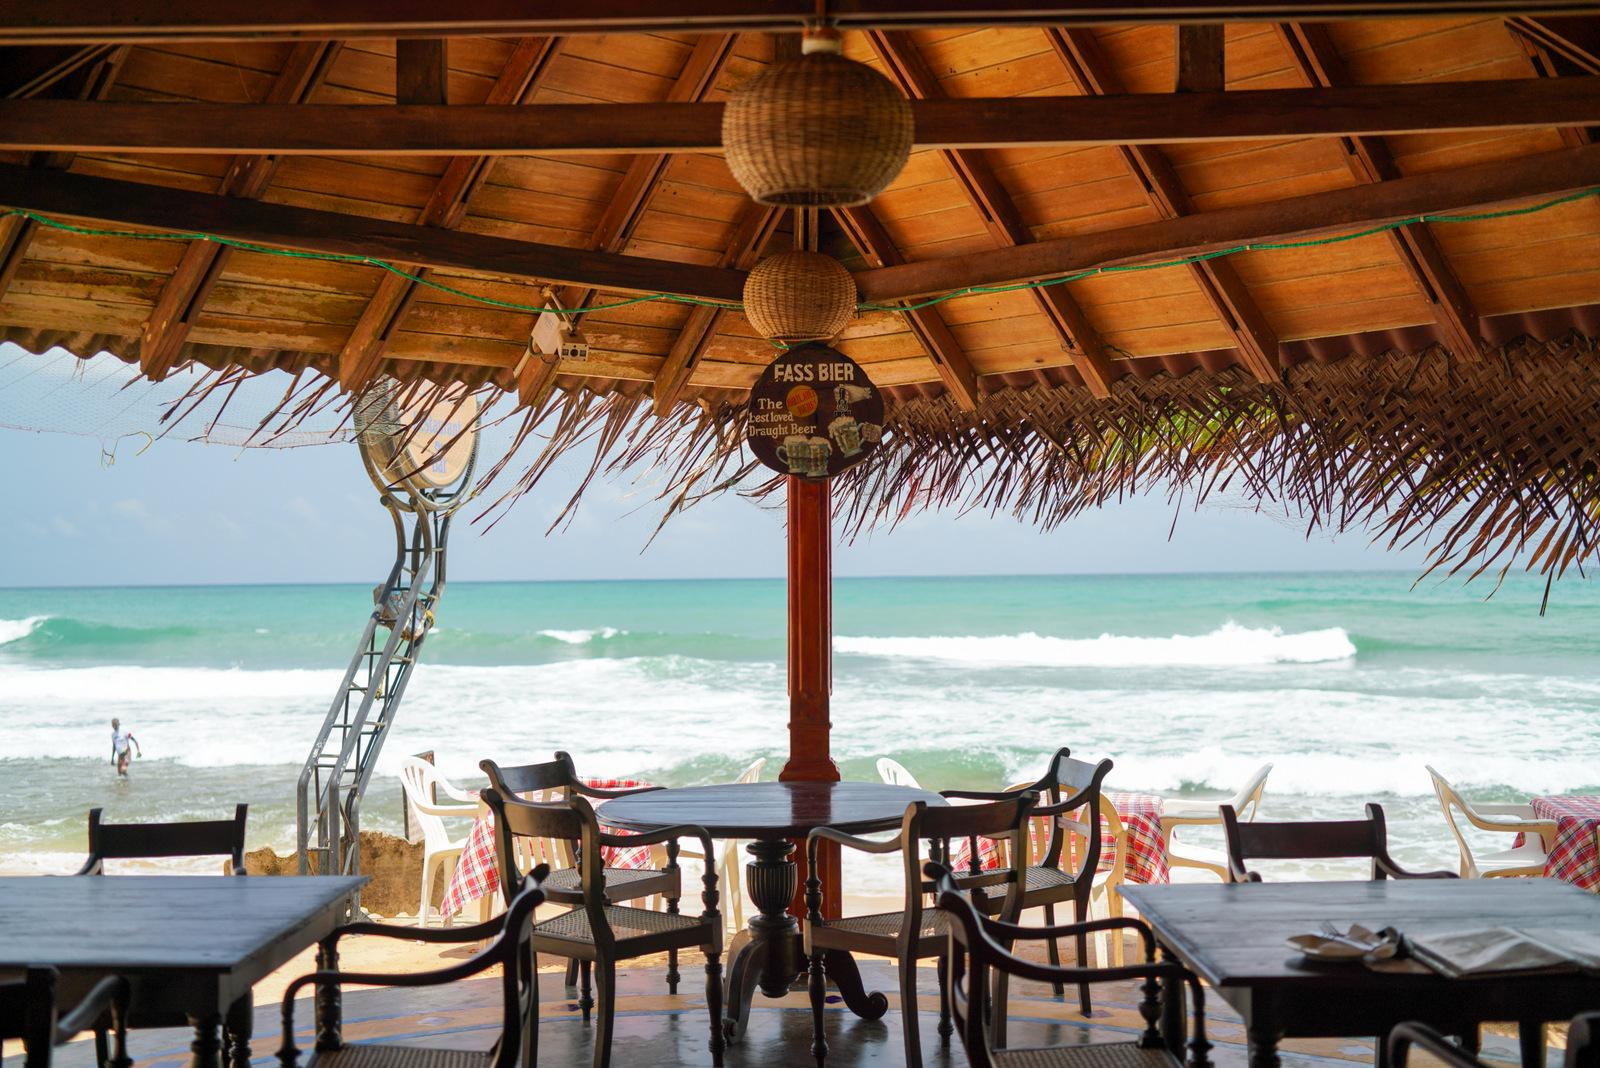 hikkaduwa beach seafood, sri lanka